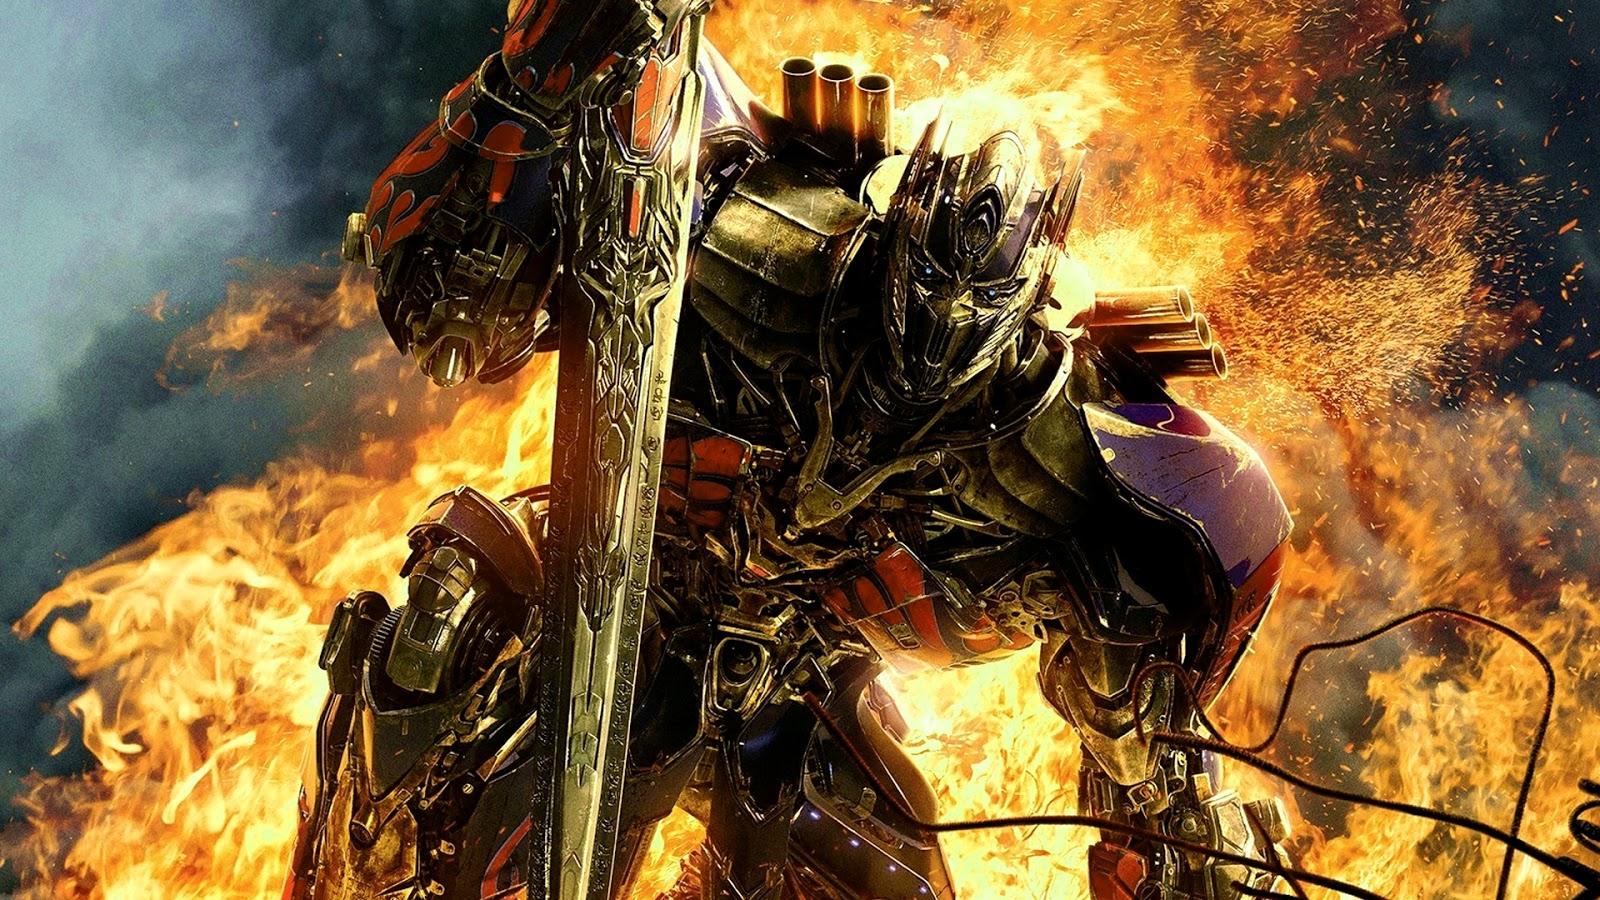 transformers age of extinction - autobot - optimus prime - 1920x1080